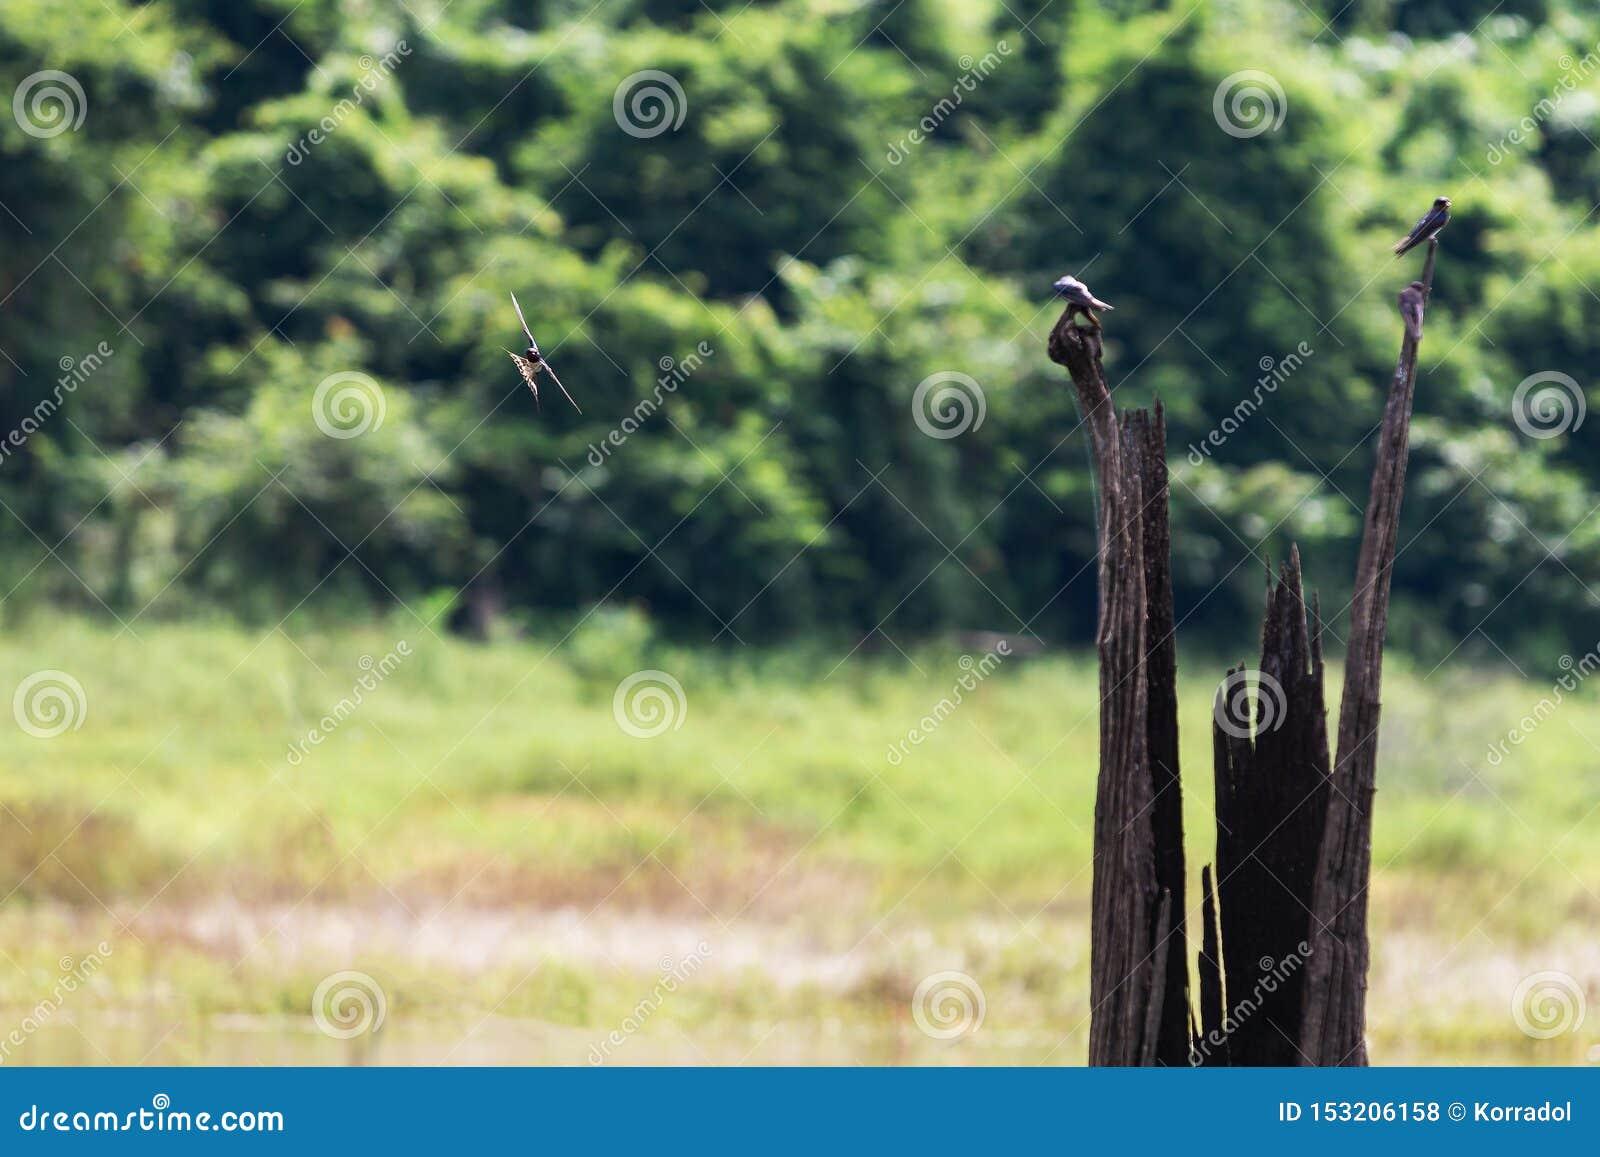 Swiftlets-Vogelfliege über dem Wasser in Hala-Bala Wildlife Sanctuary nahe Knall Lang Reservoir in Yala